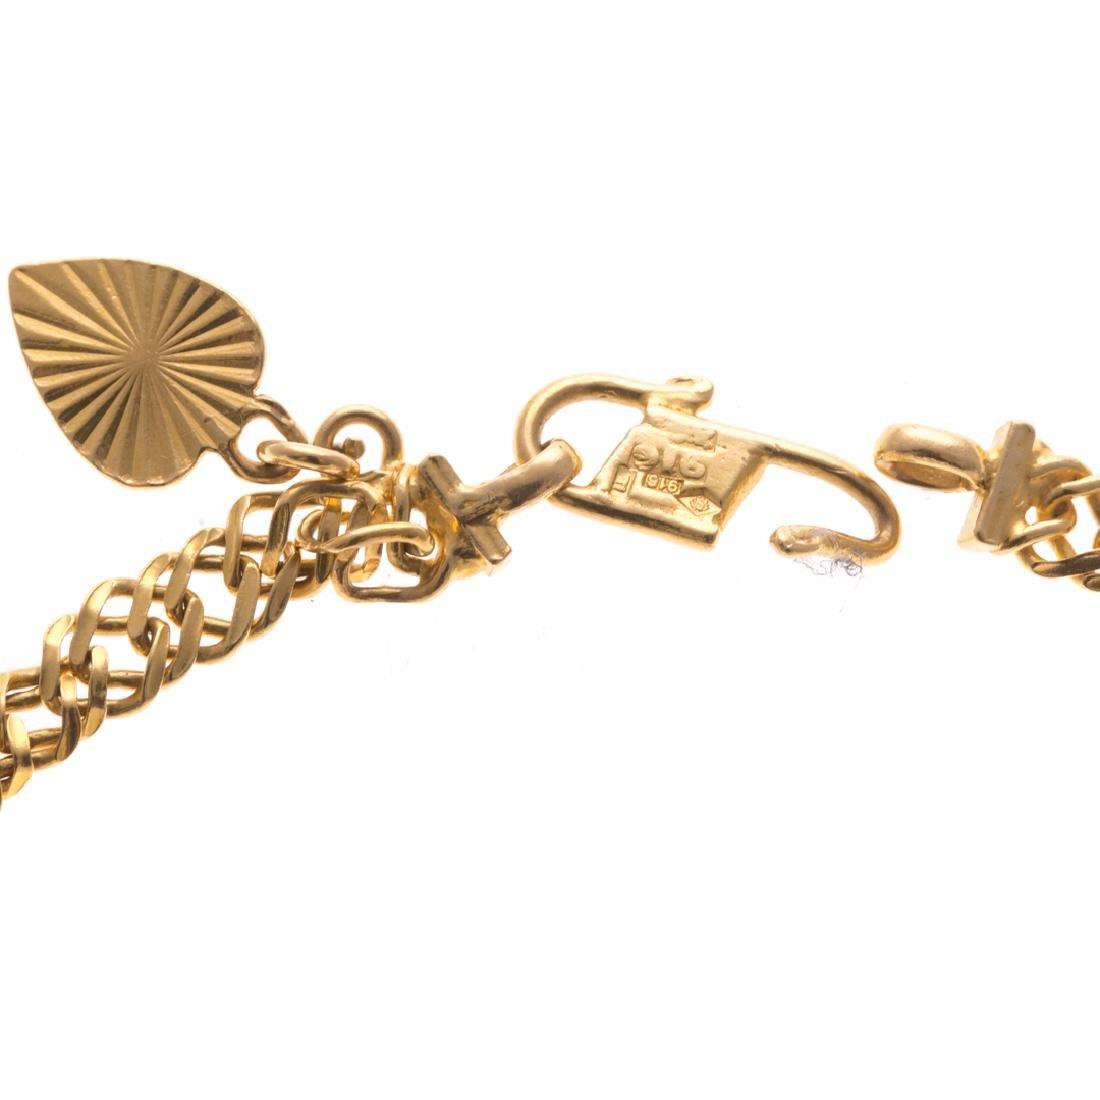 A Lady's 22K Flat Curbed Link Bracelet - 3